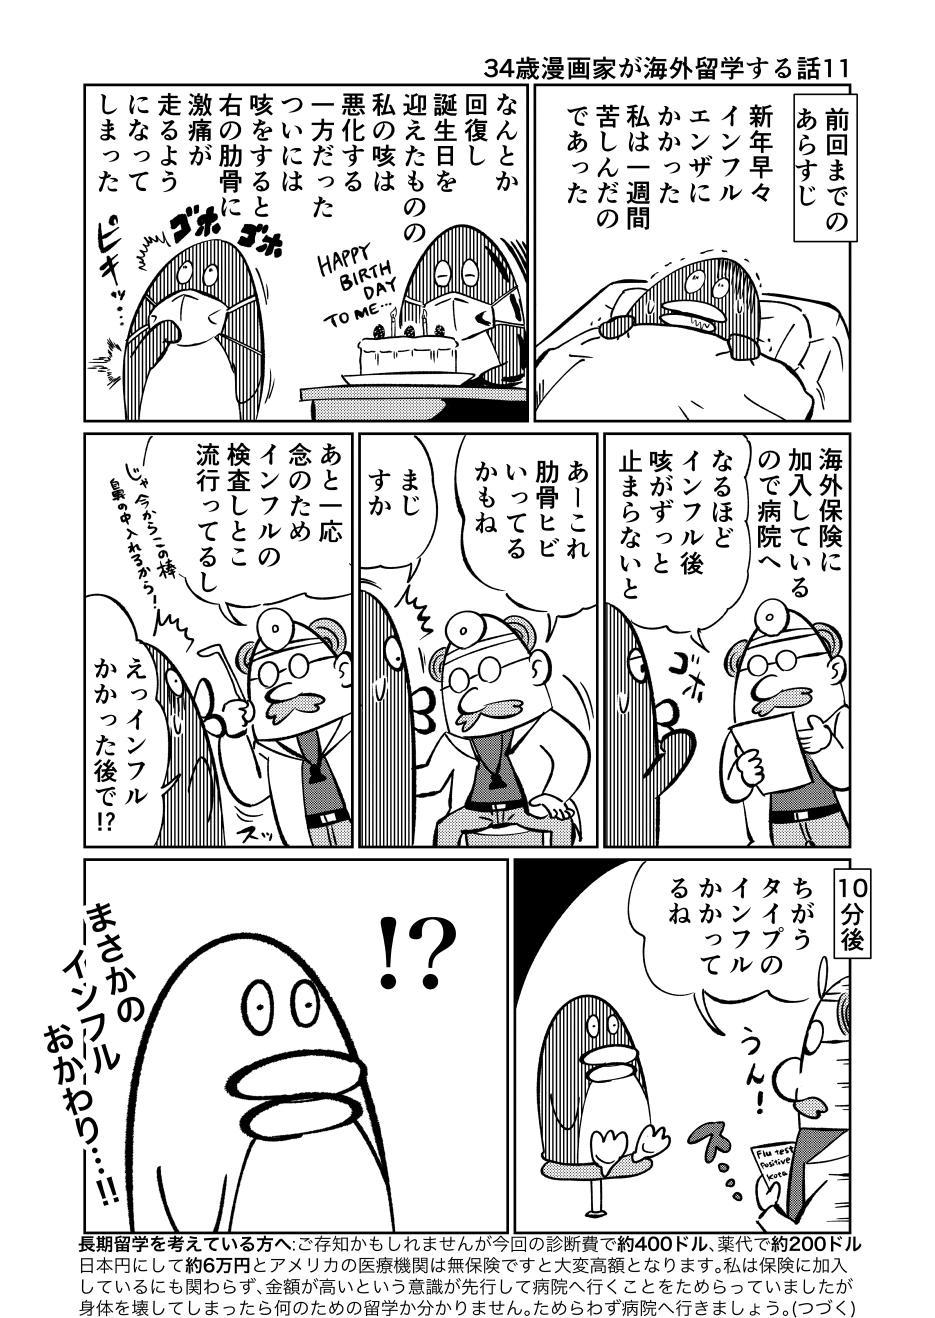 https://www.ryugaku.co.jp/blog/els_portland/upload/episode11.jpg